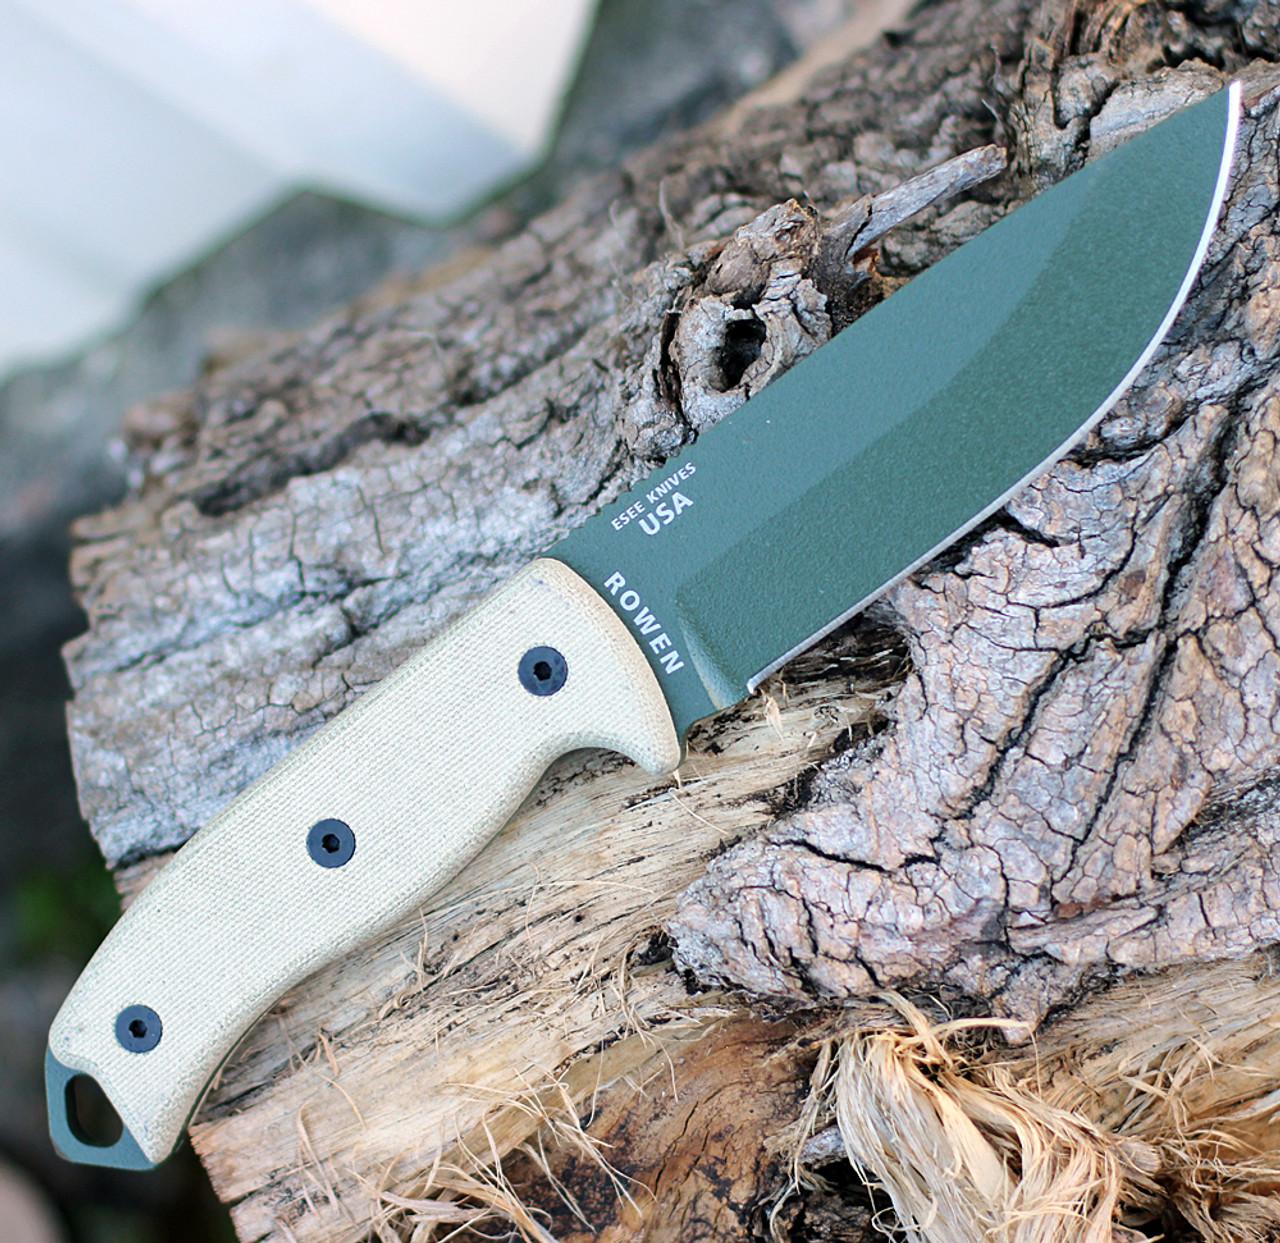 ESEE Knives, 5P-KO-OD, OD Green Blade, Plain Edge, Micarta Handle, Knife Only, No Sheathing